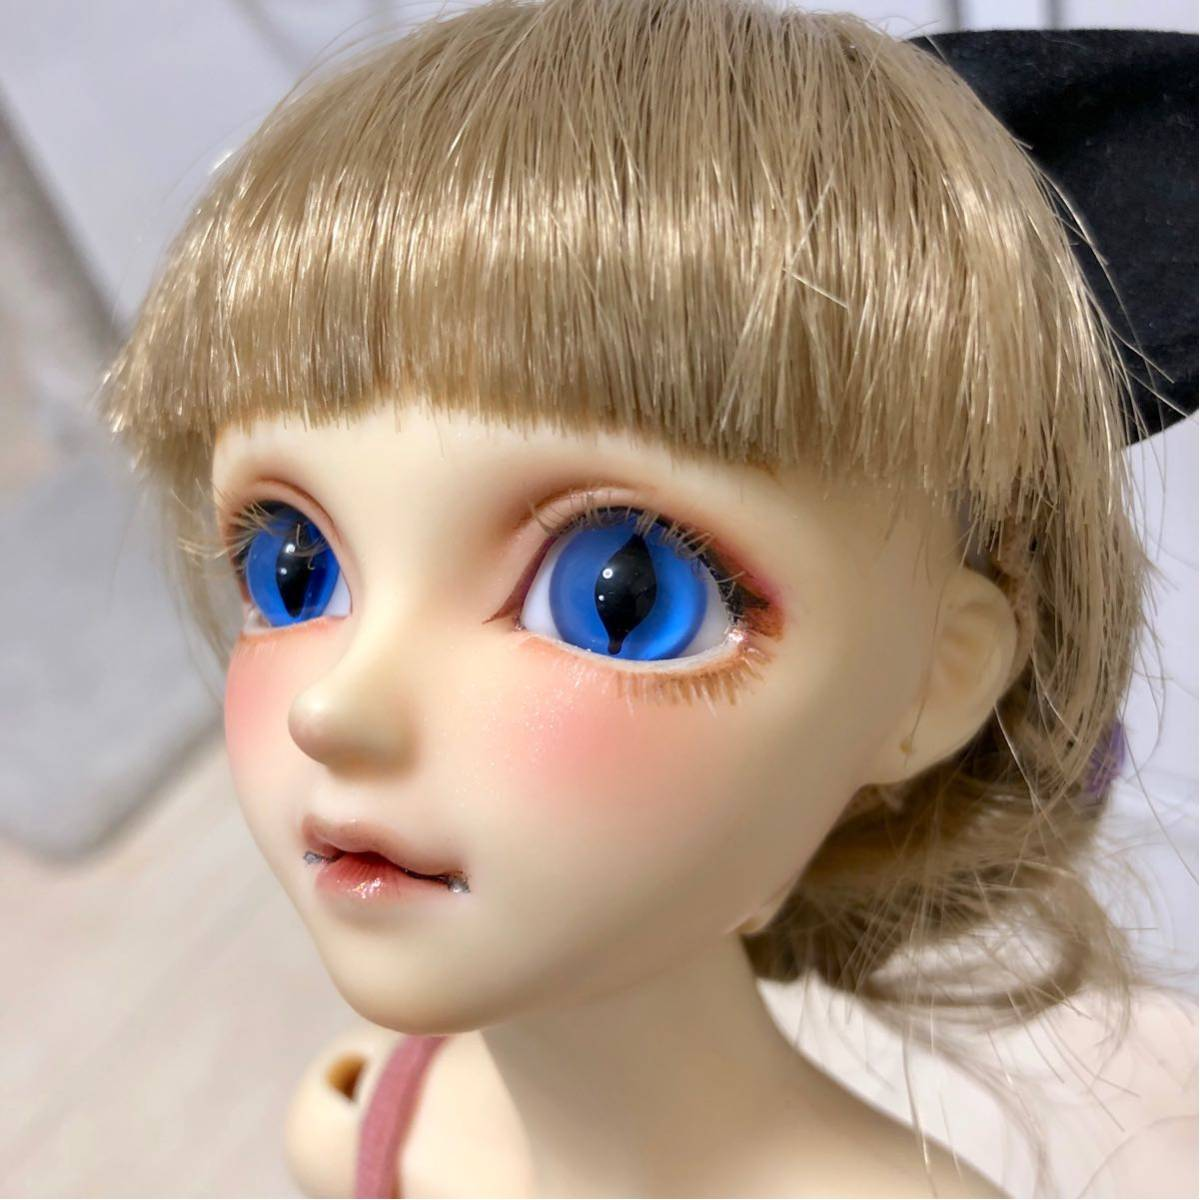 SDCute 女の子 Rene(黒猫ルネ)SDC すわりこタイプ_画像2